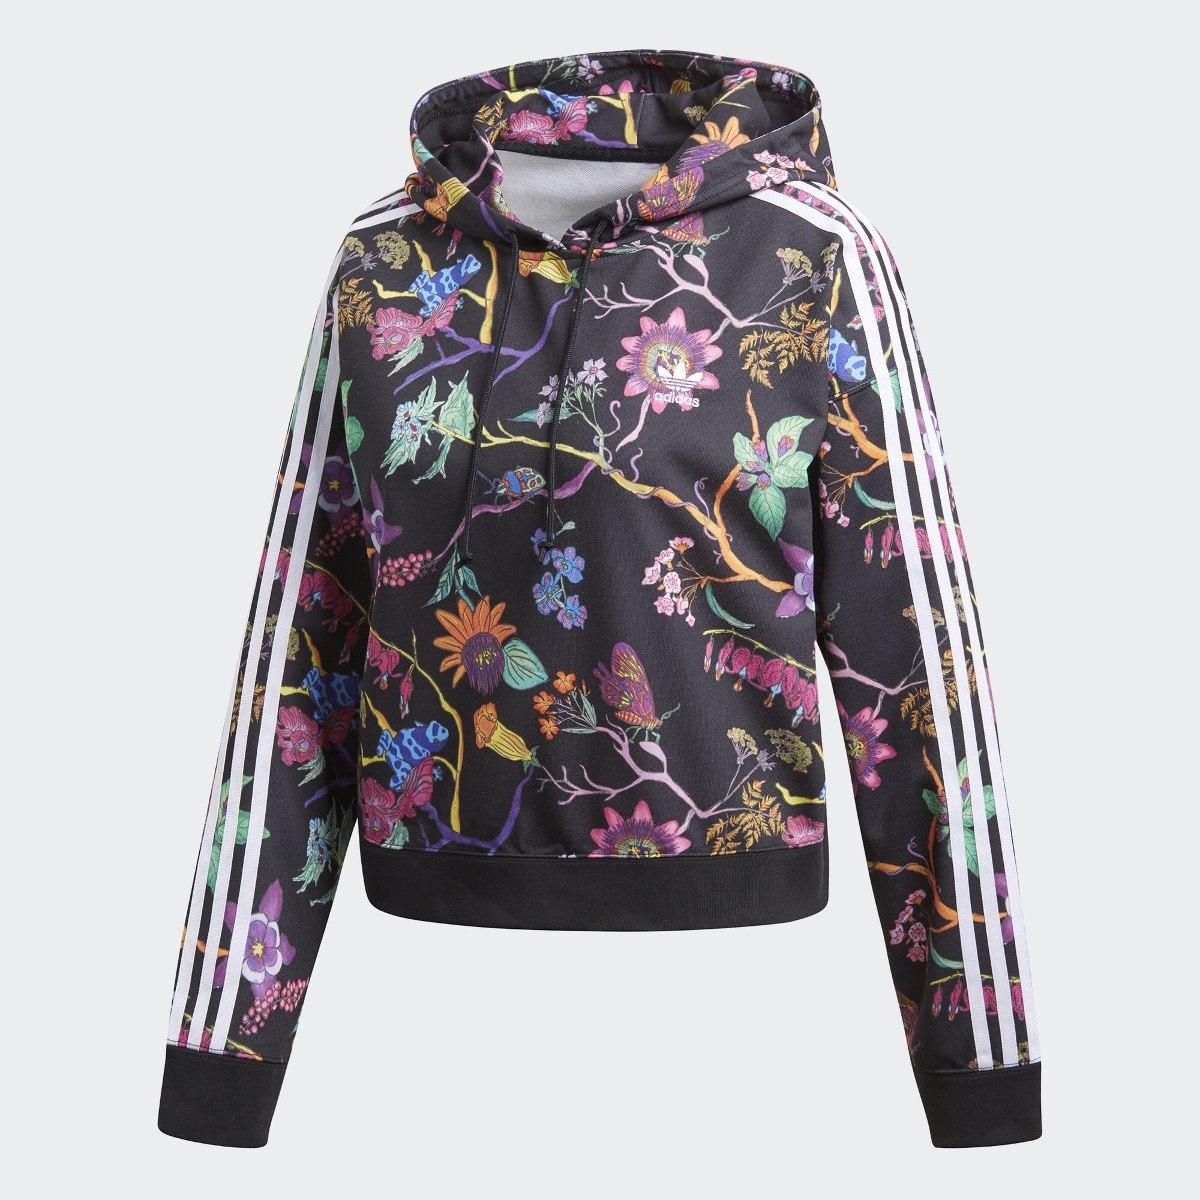 Originals Gratis Envío Sudadera 00 Adidas 300 Original Dt8292 1 g5ffAnqwU